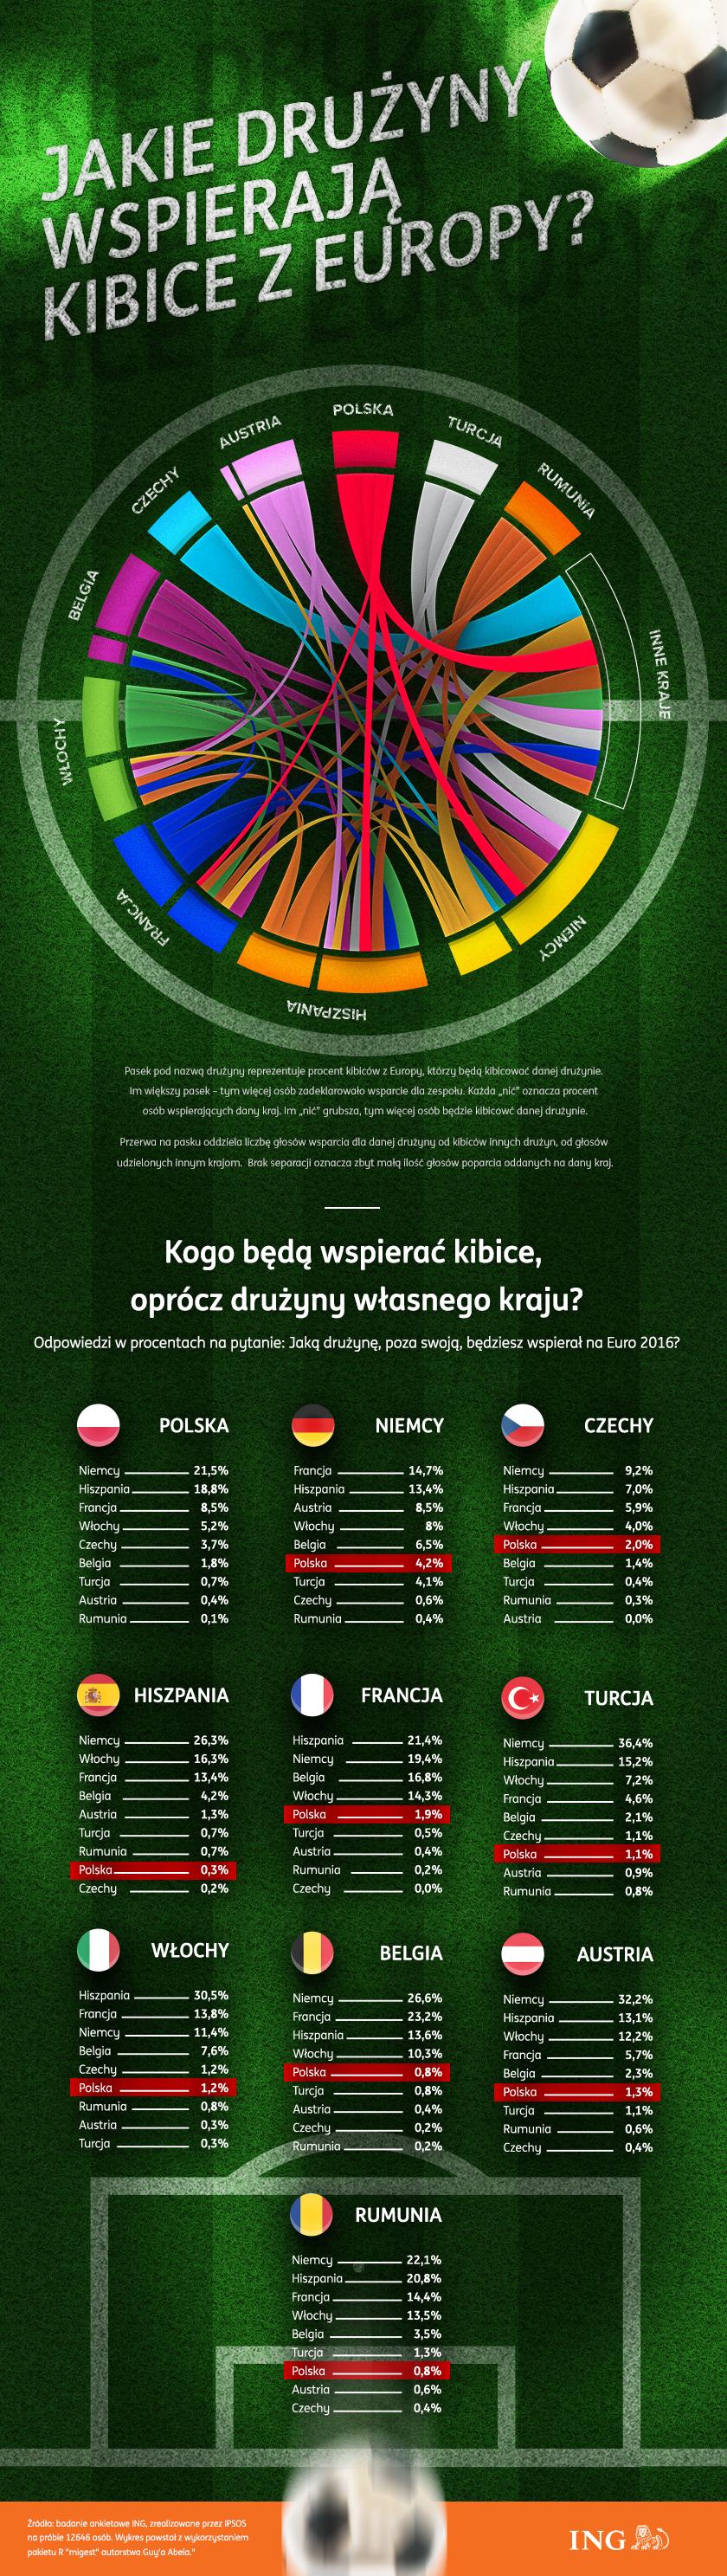 Euro 2016 - komu kibicujemy - infografika